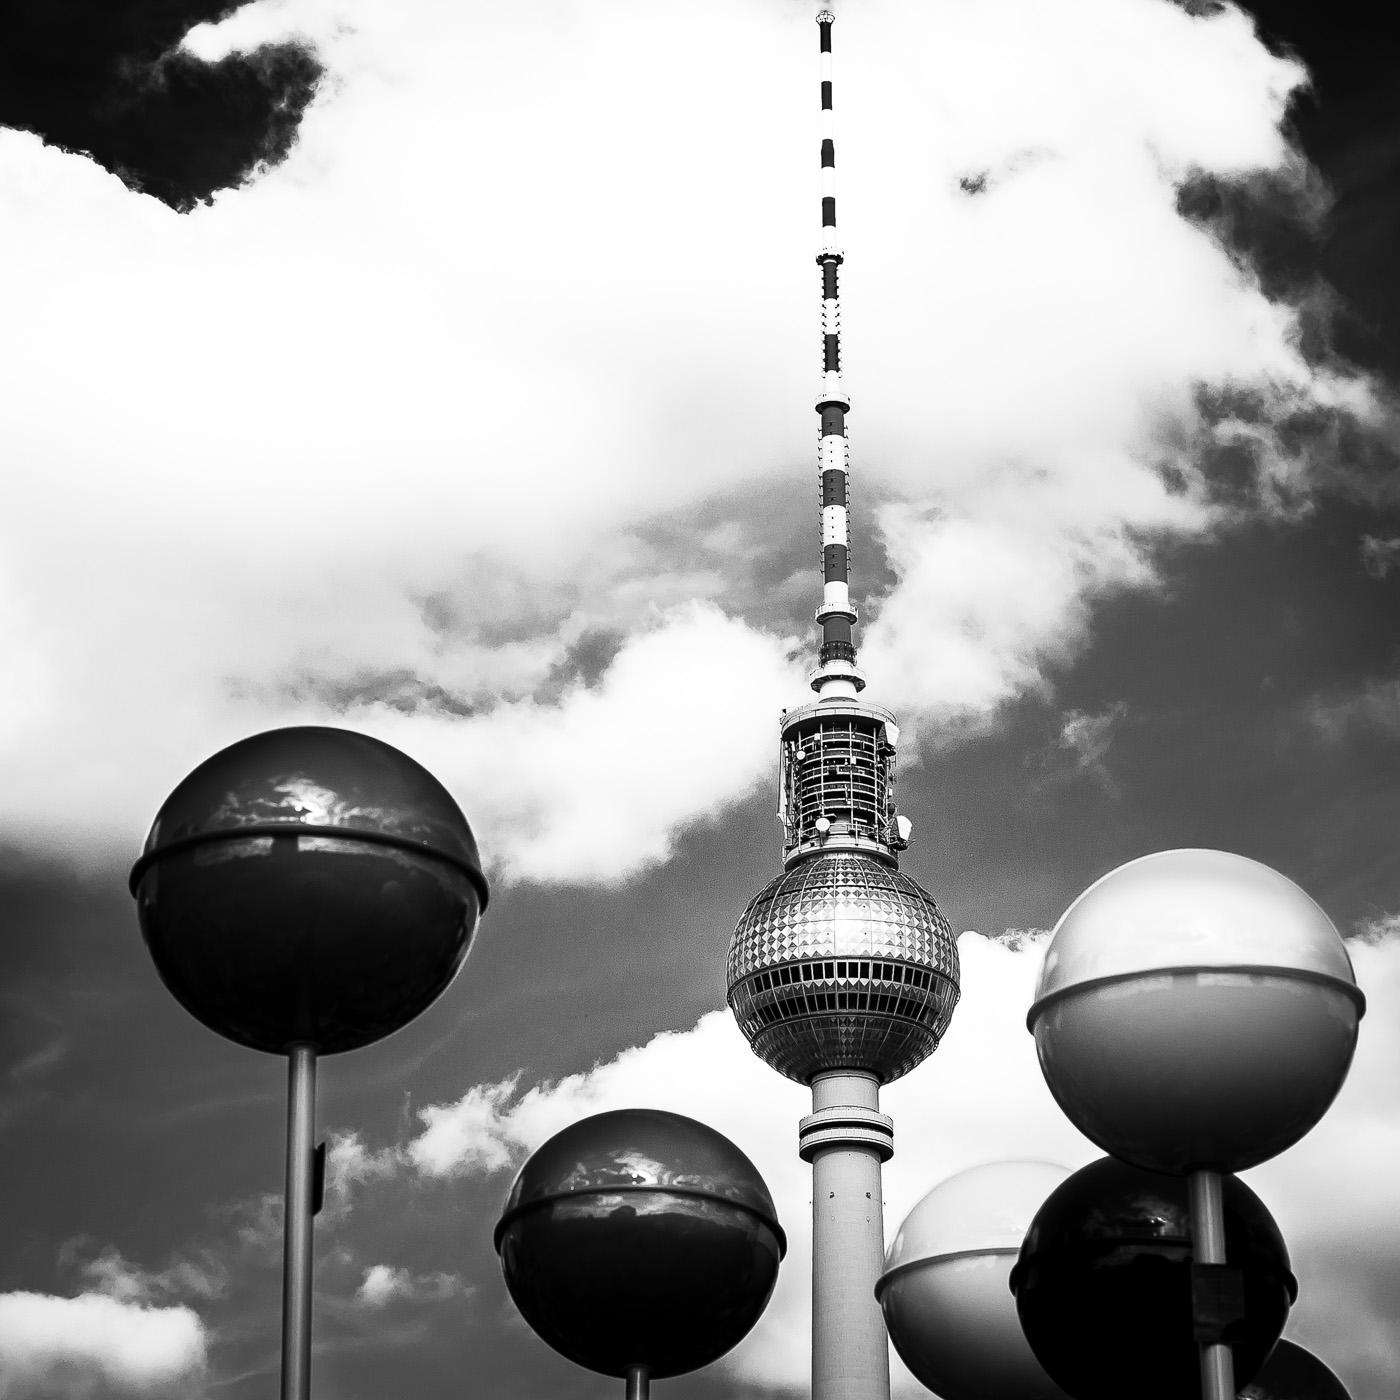 Spheres around the tower